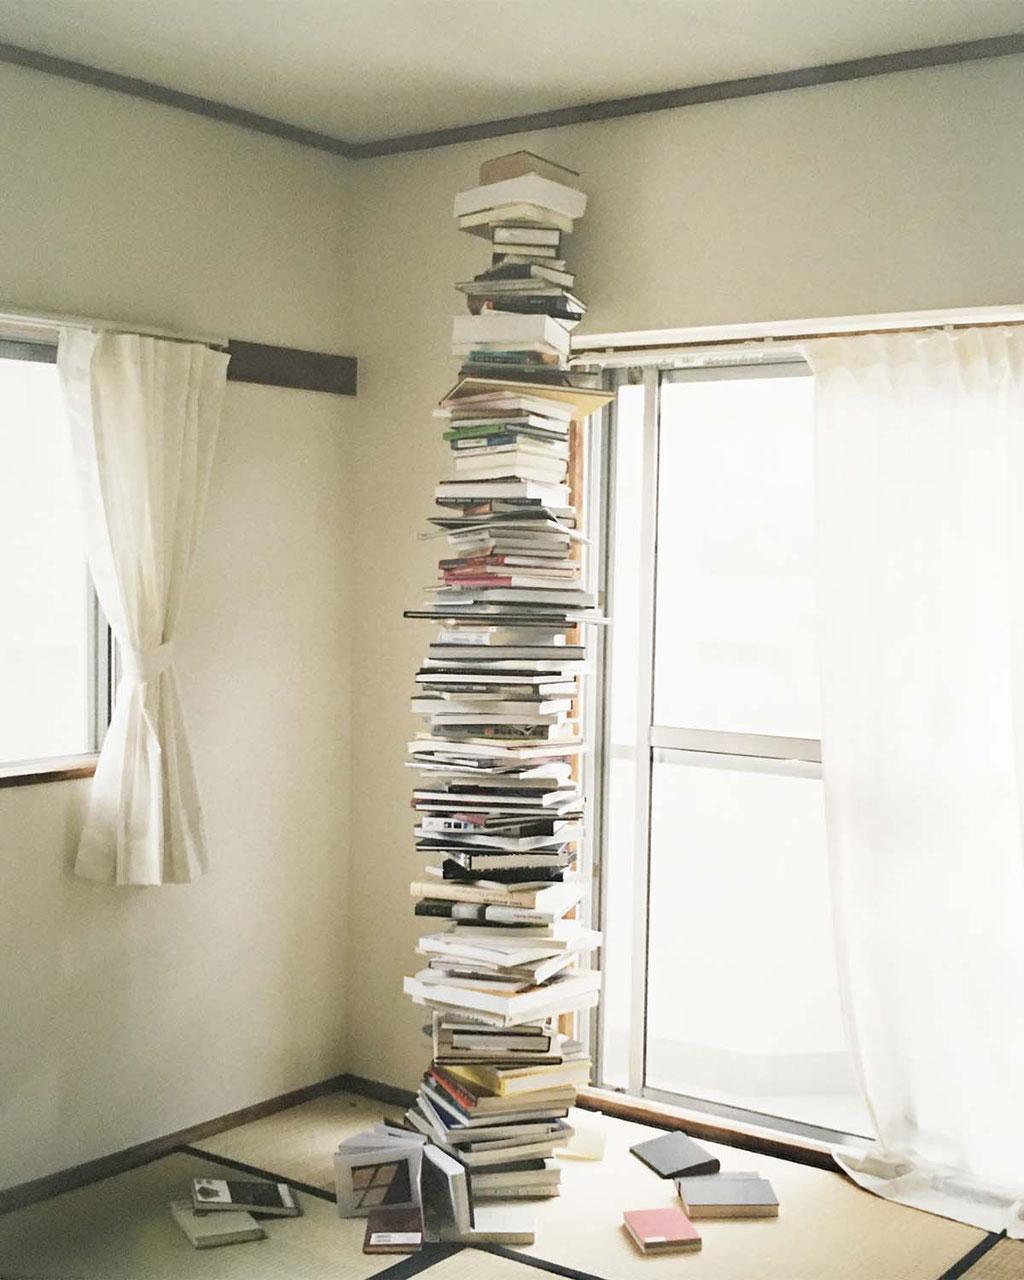 Books / Waterfall・20120-2020 ・Chromogenic print